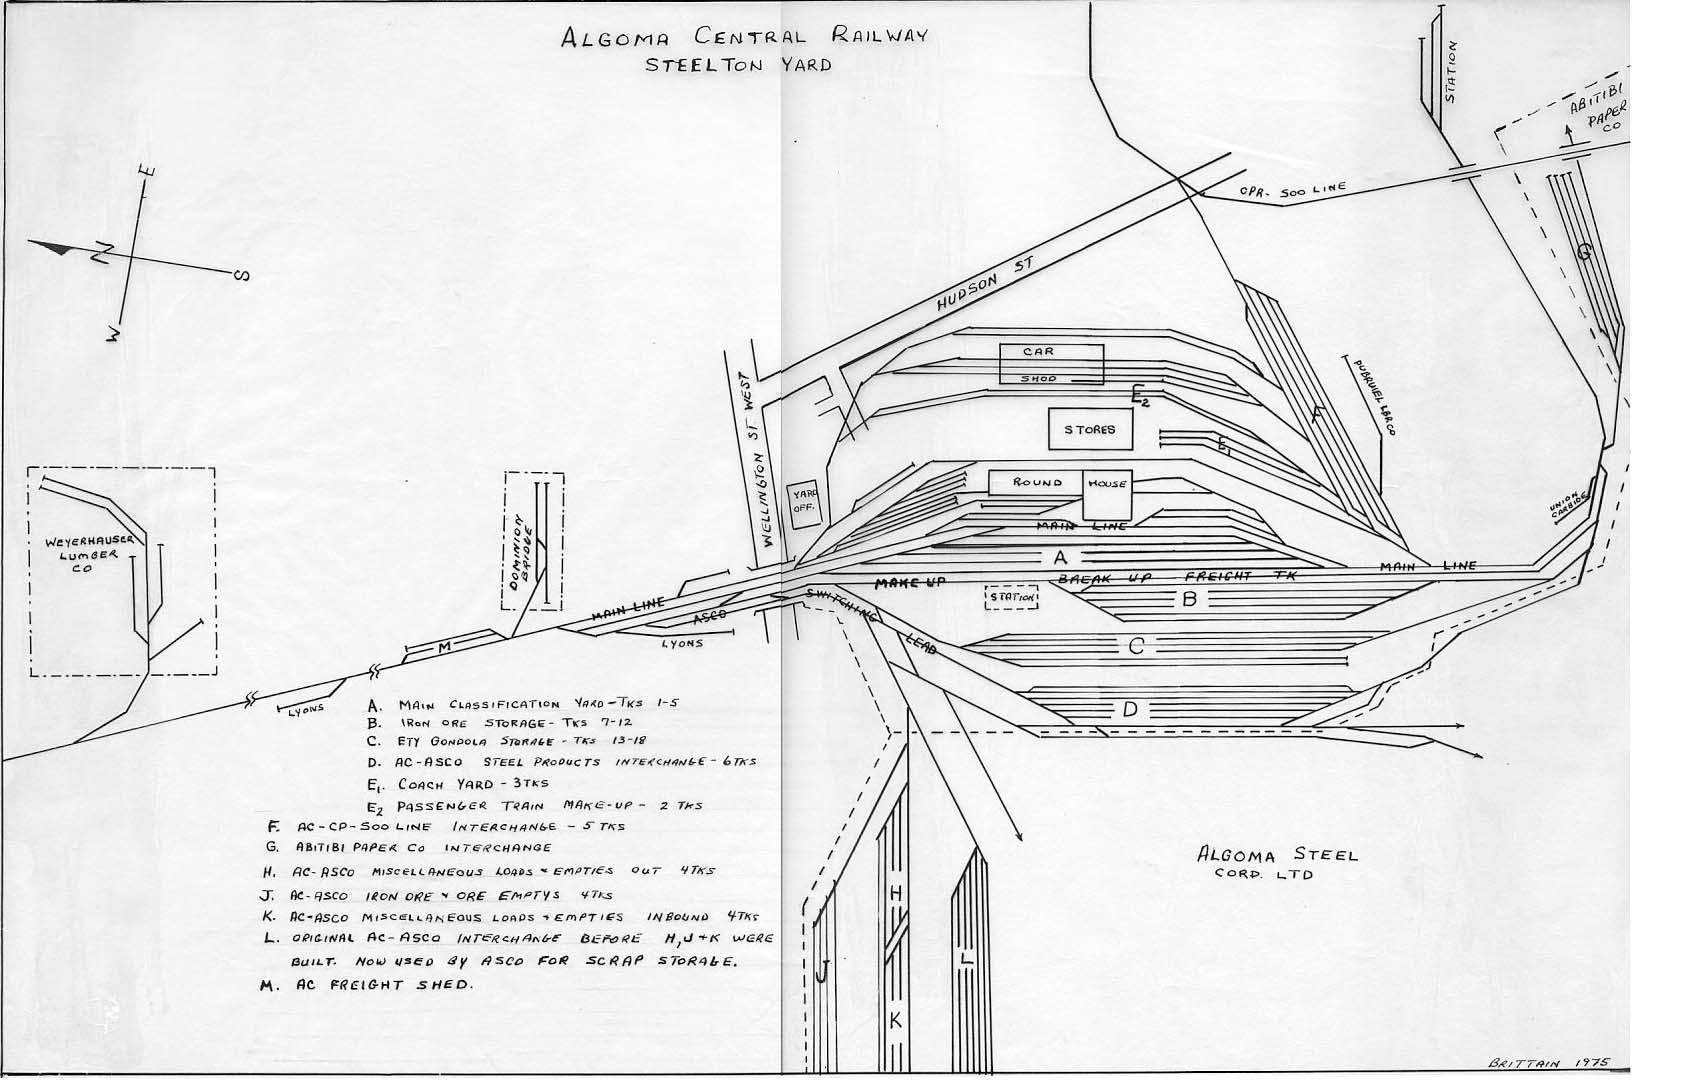 railroad yard schematic diagrams